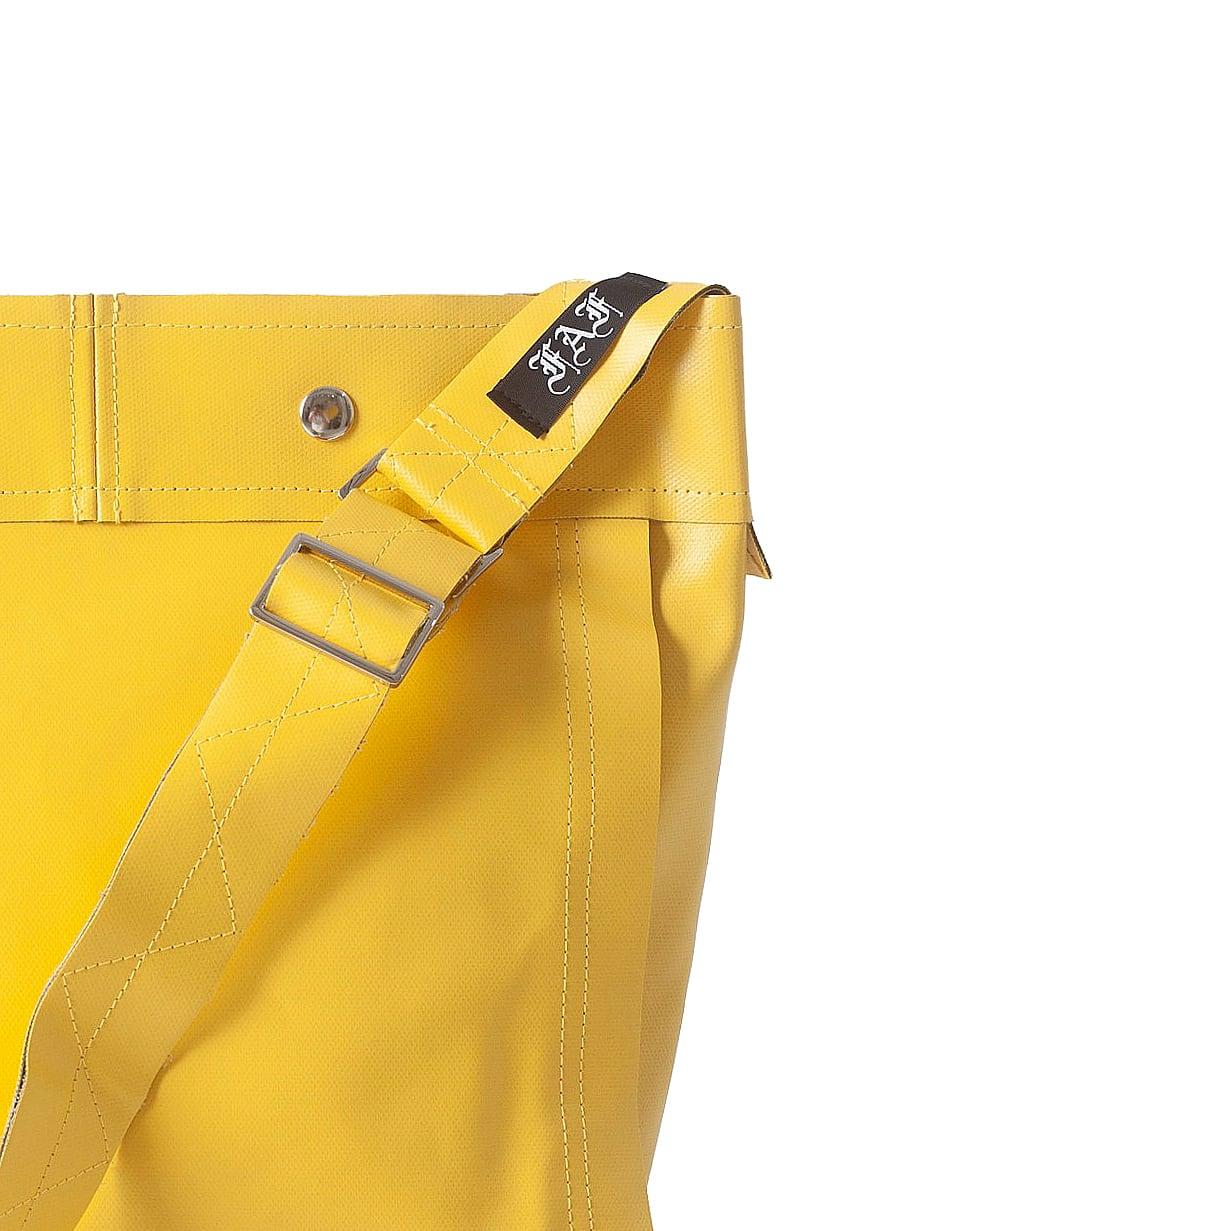 PVC CANVAS SMALL SHOULDER BAG / YELLOW GREEN - 画像2